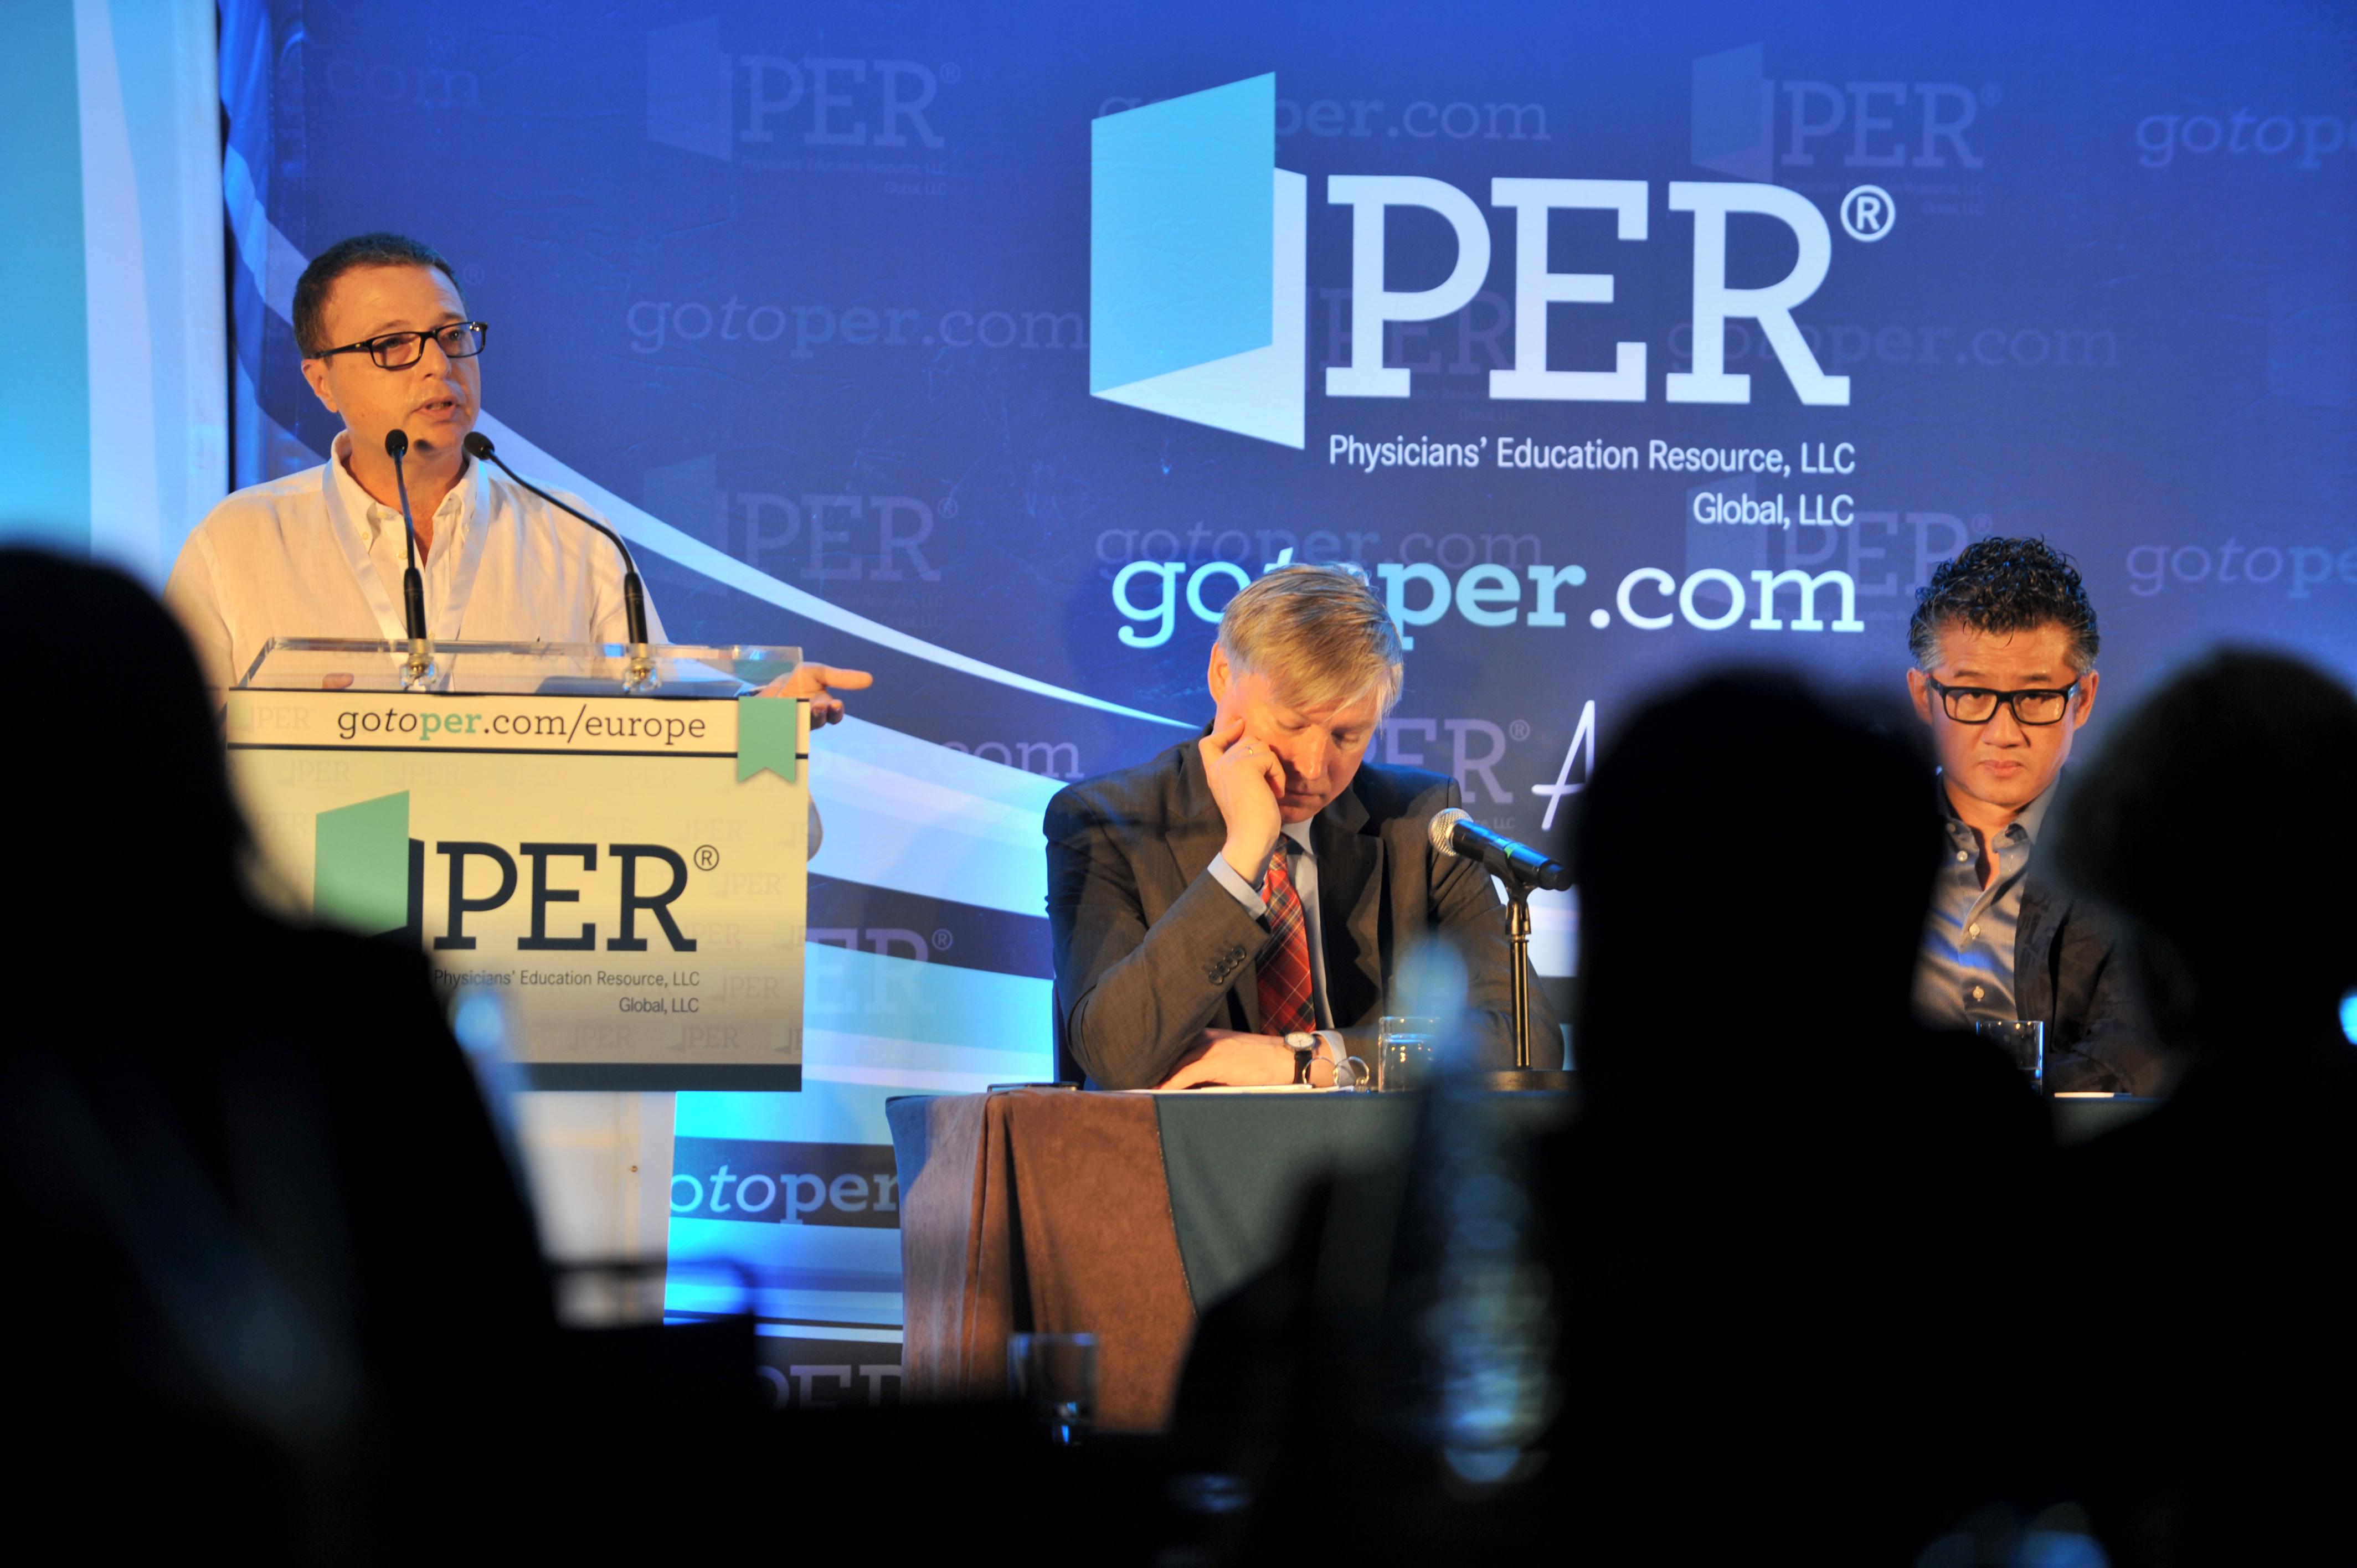 Nicola Normanno, MD; Prof. Dr. med. Martin Reck; Tony Mok, MD